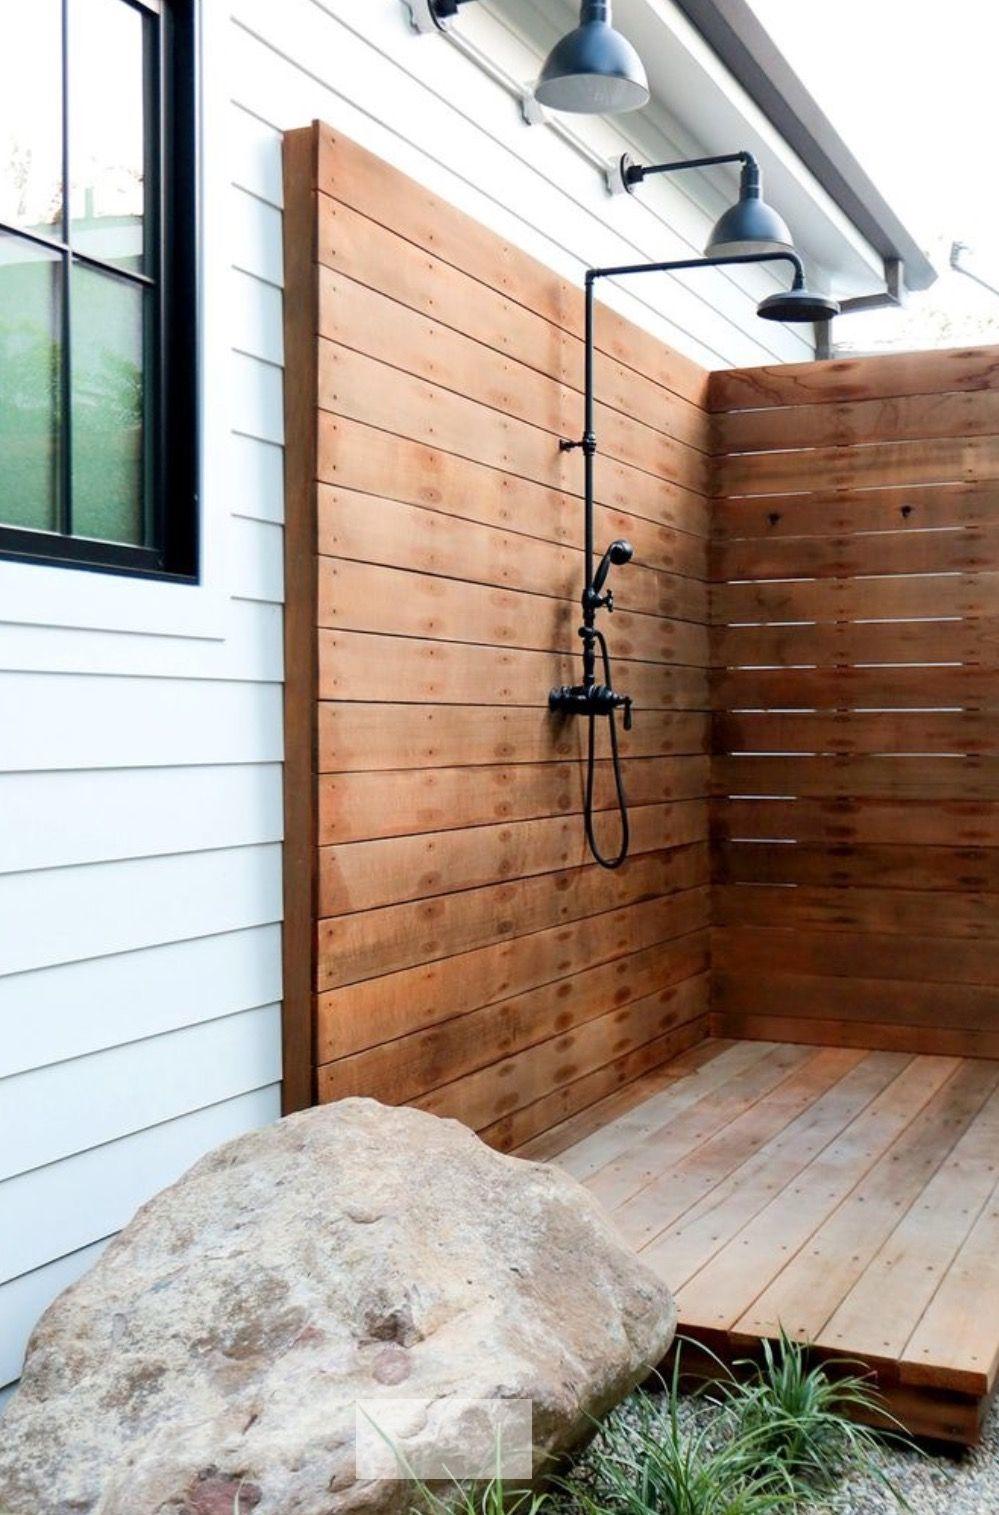 outdoor shower. could it work north end of garage under deck ...